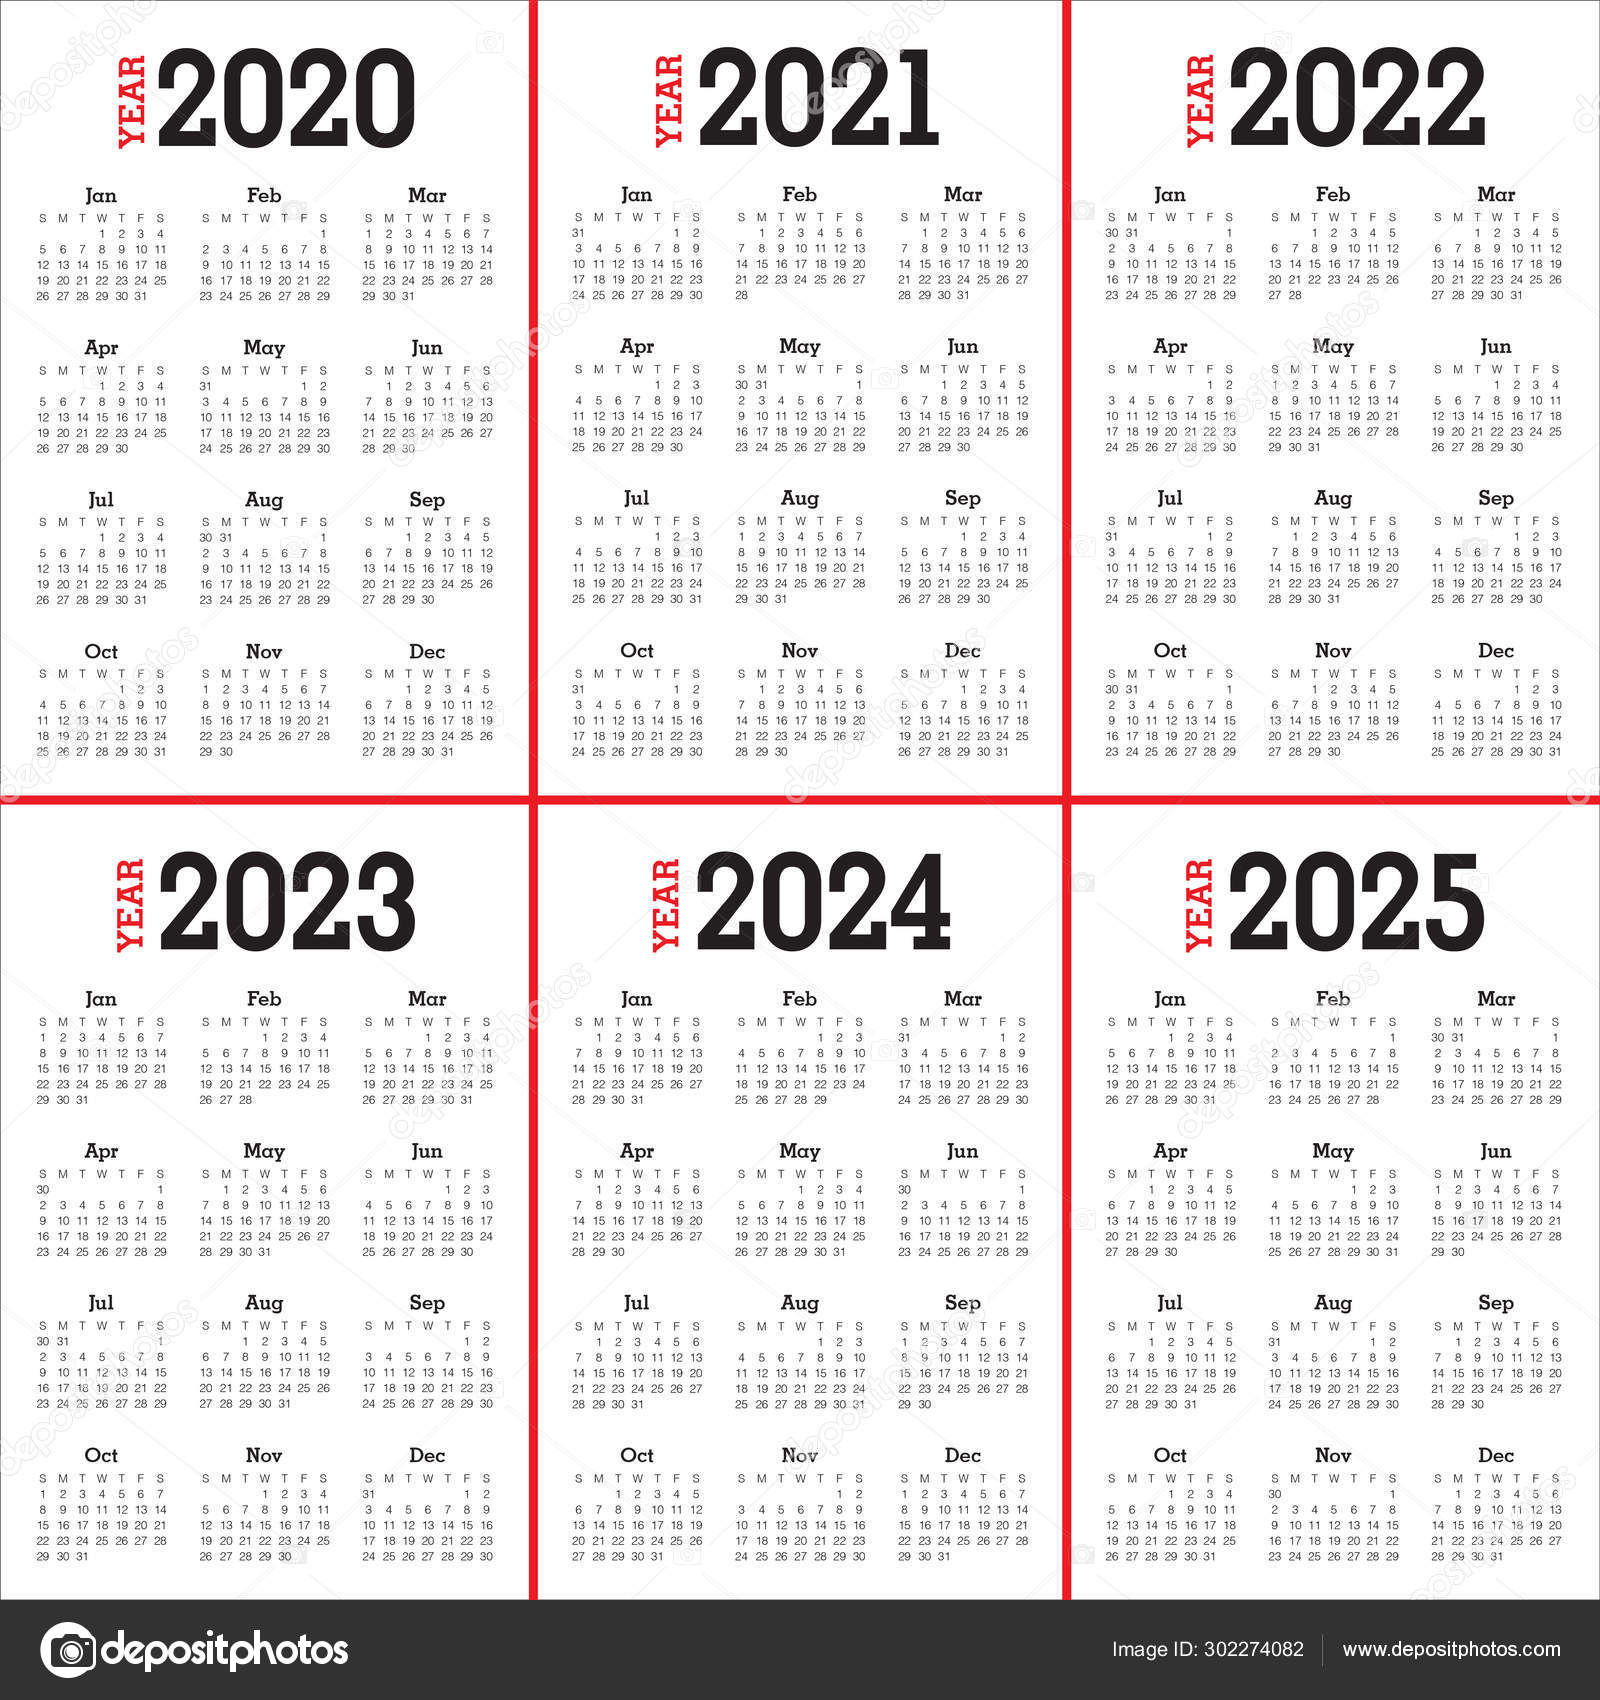 Calendar 2022 2023.Year 2020 2021 2022 2023 2024 2025 Calendar Design Stock Photo Image By C Dolphfynlow 302274082